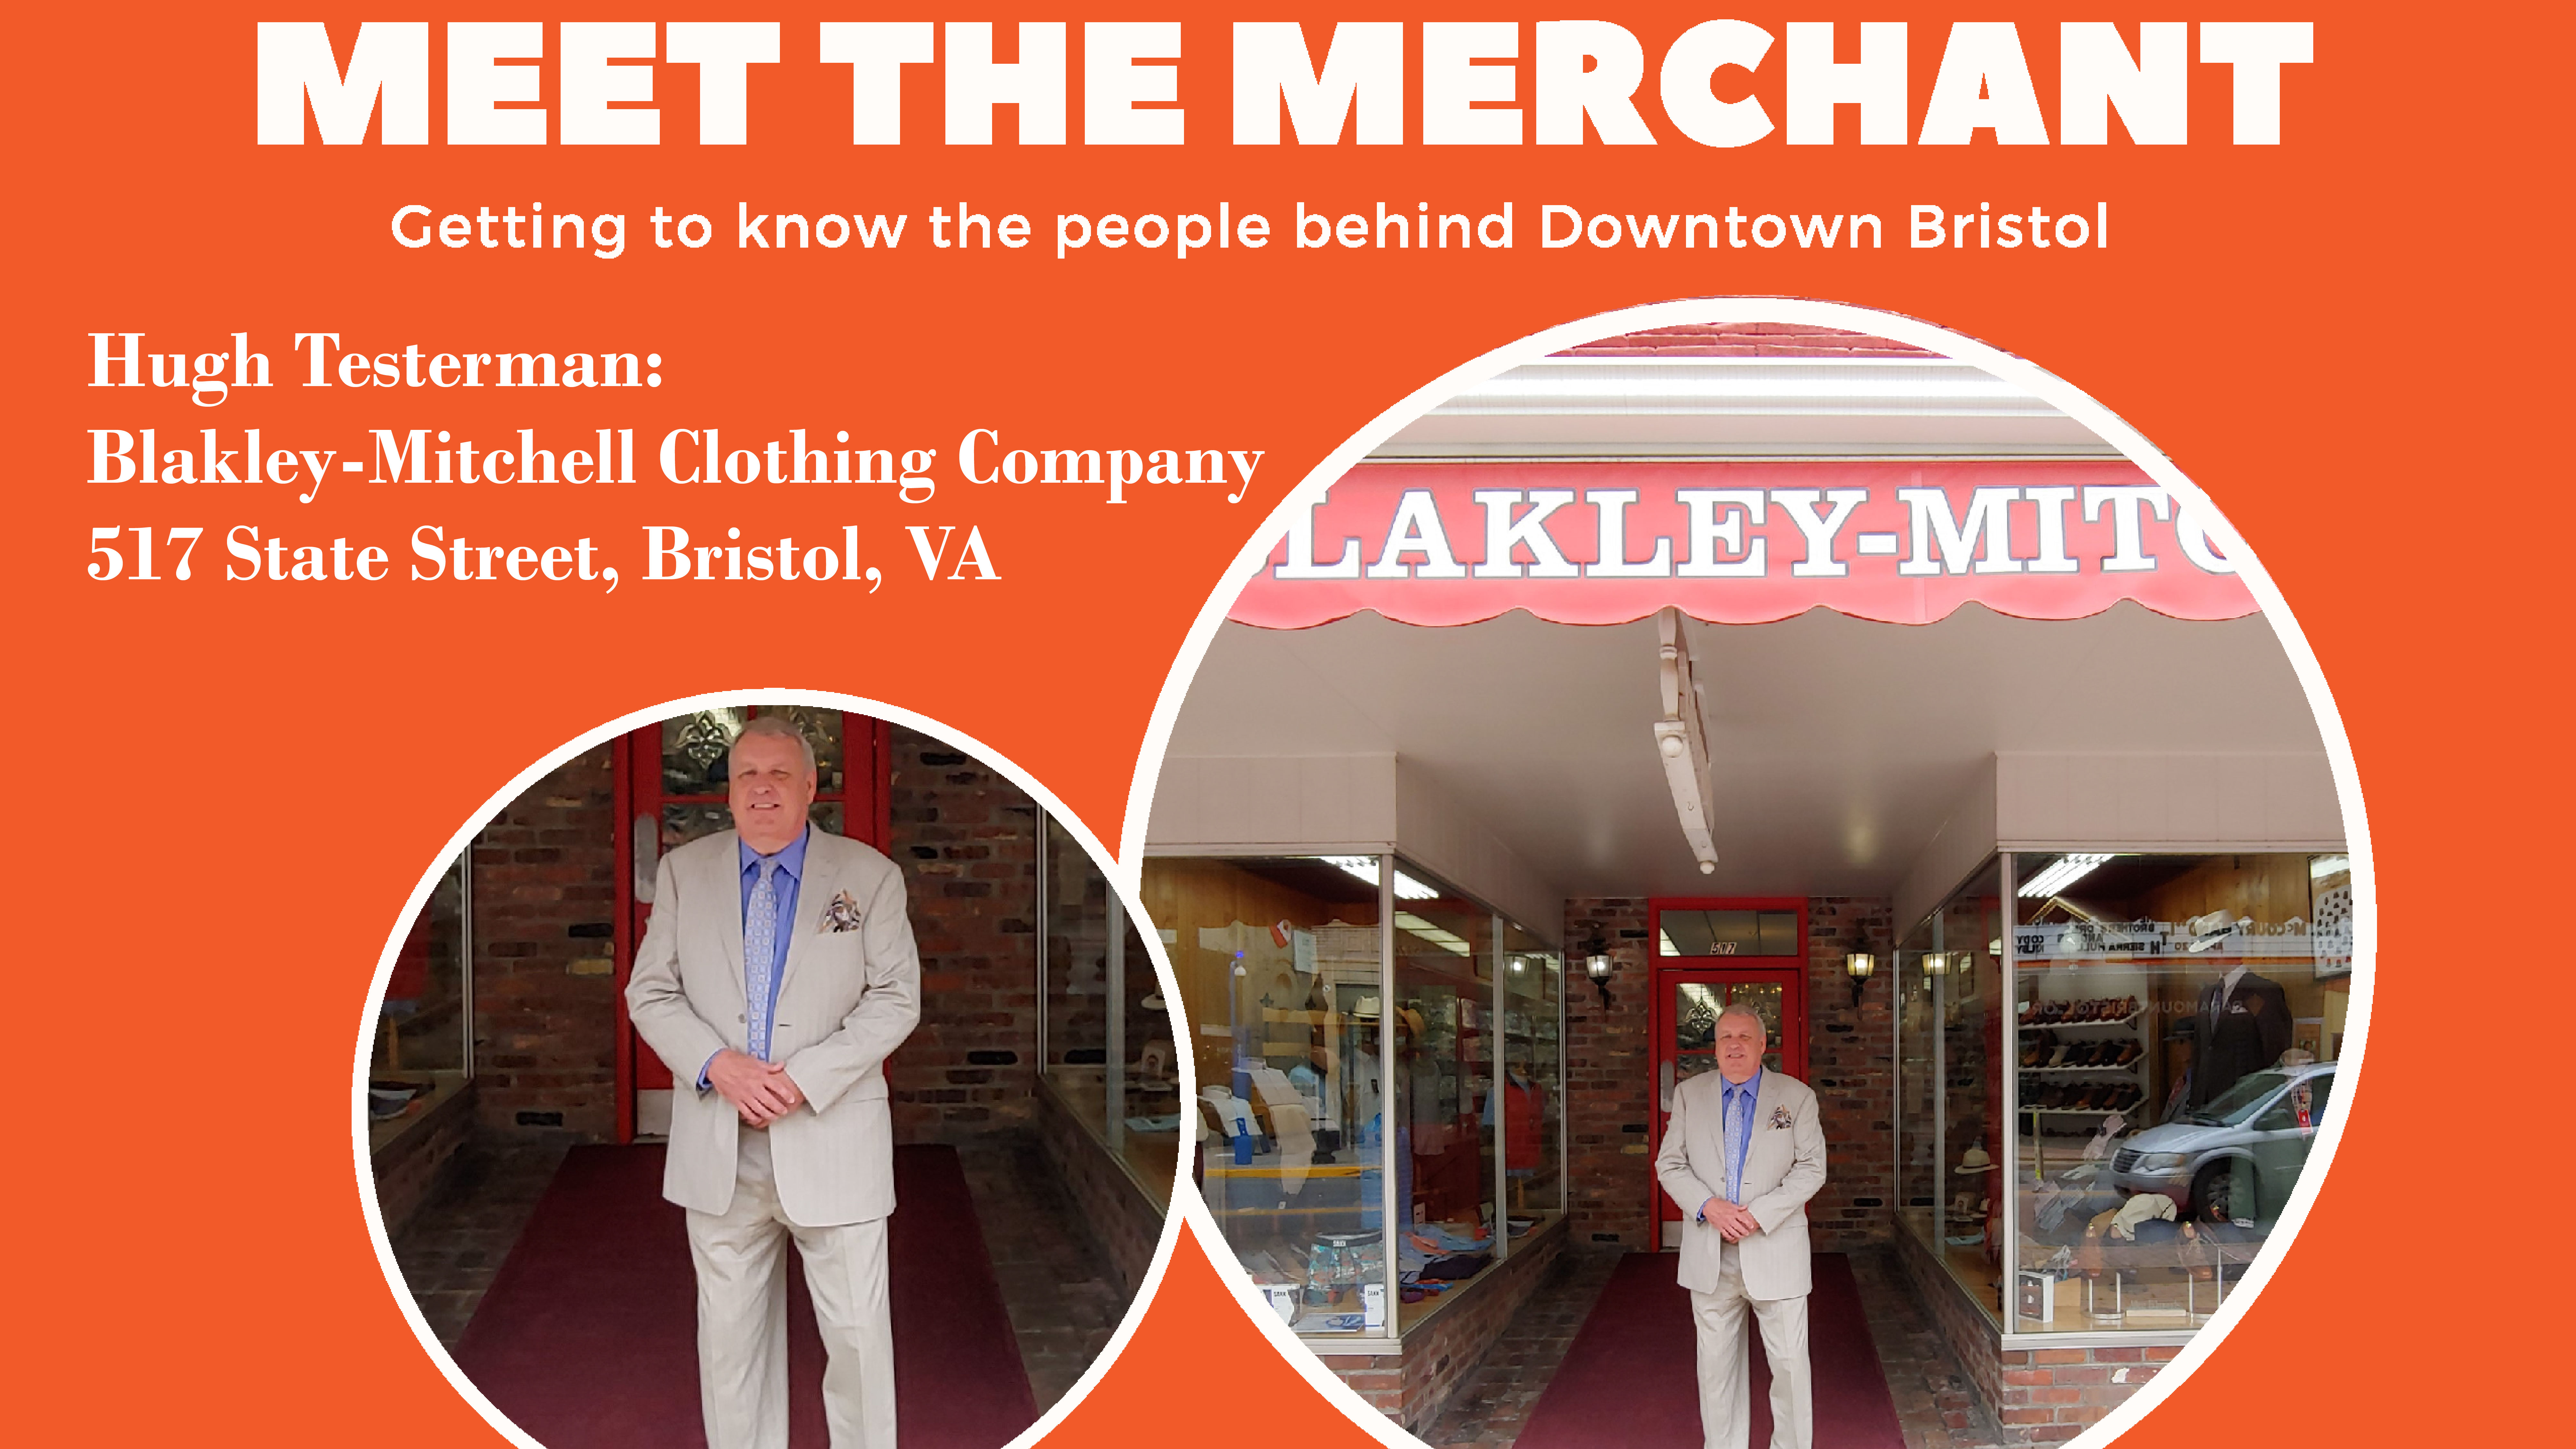 fdd01bcad4b Meet the Merchant  Hugh Testerman with Blakley-Mitchell Clothing Company